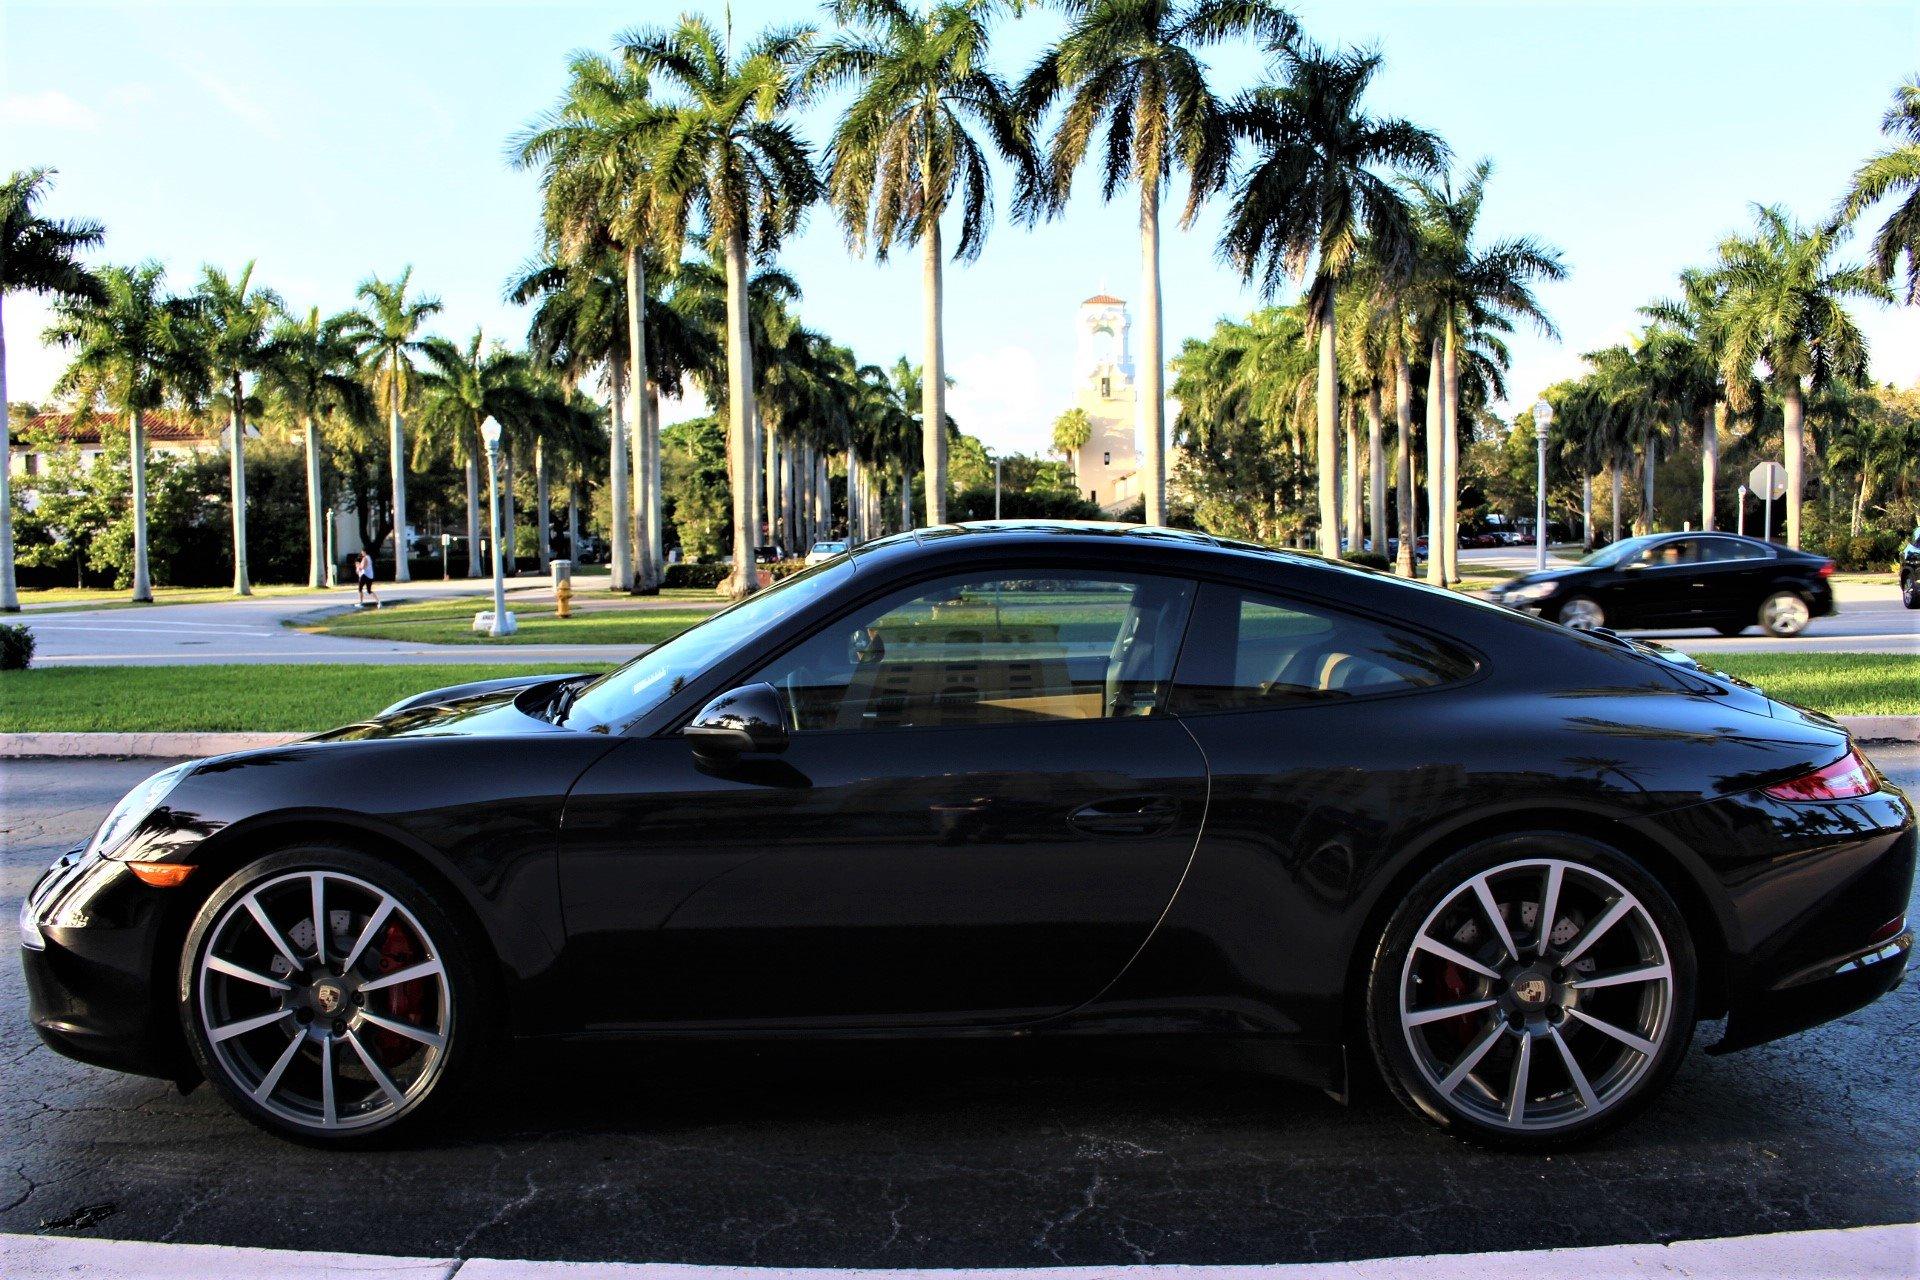 Used 2013 Porsche 911 Carrera S for sale $59,850 at The Gables Sports Cars in Miami FL 33146 3